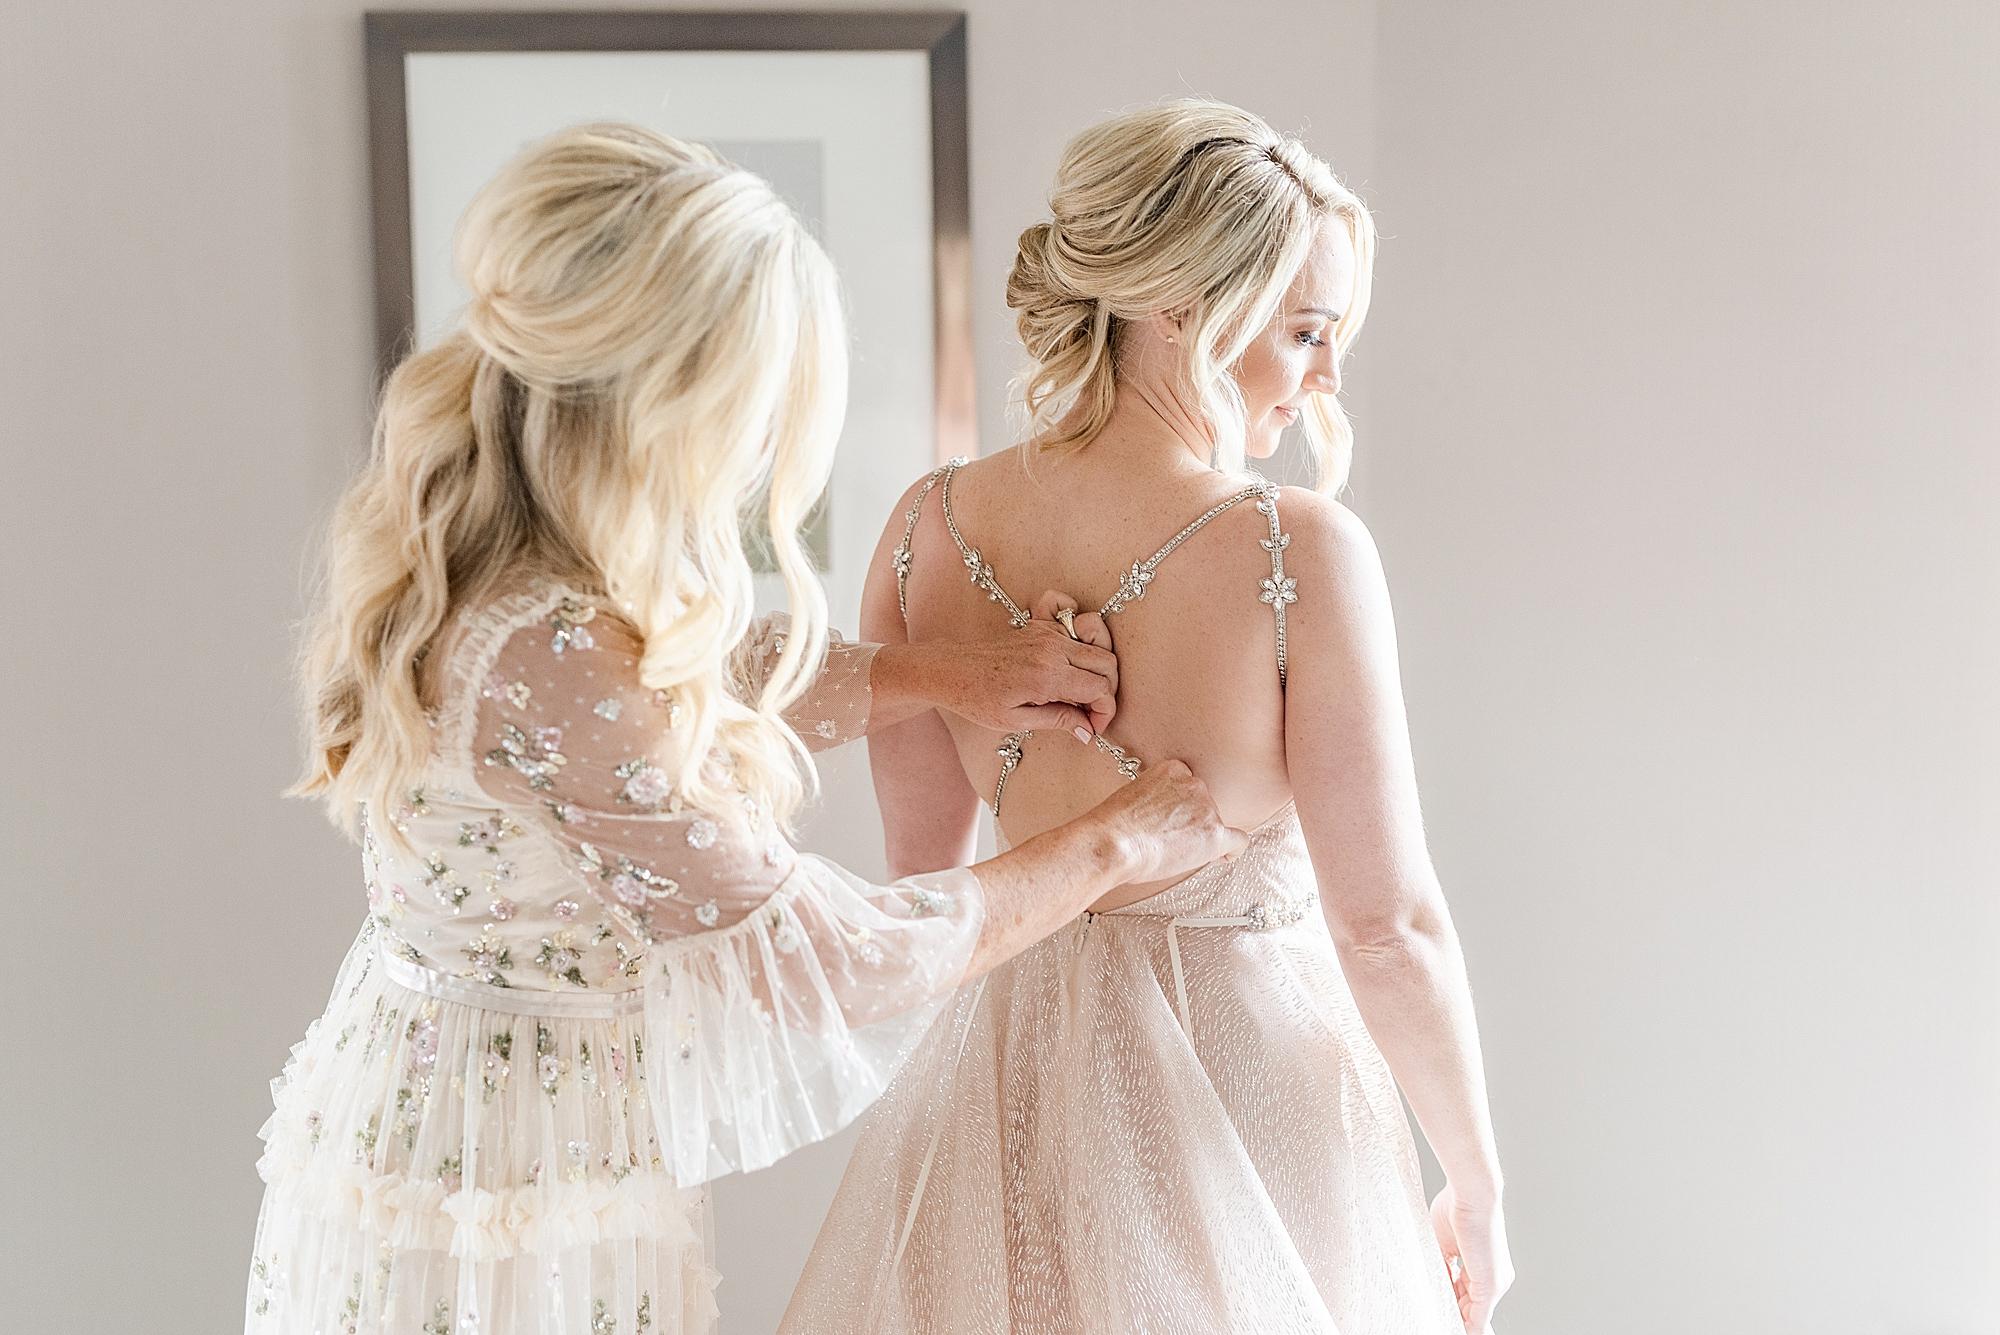 mother of bride adjusts gown for bride